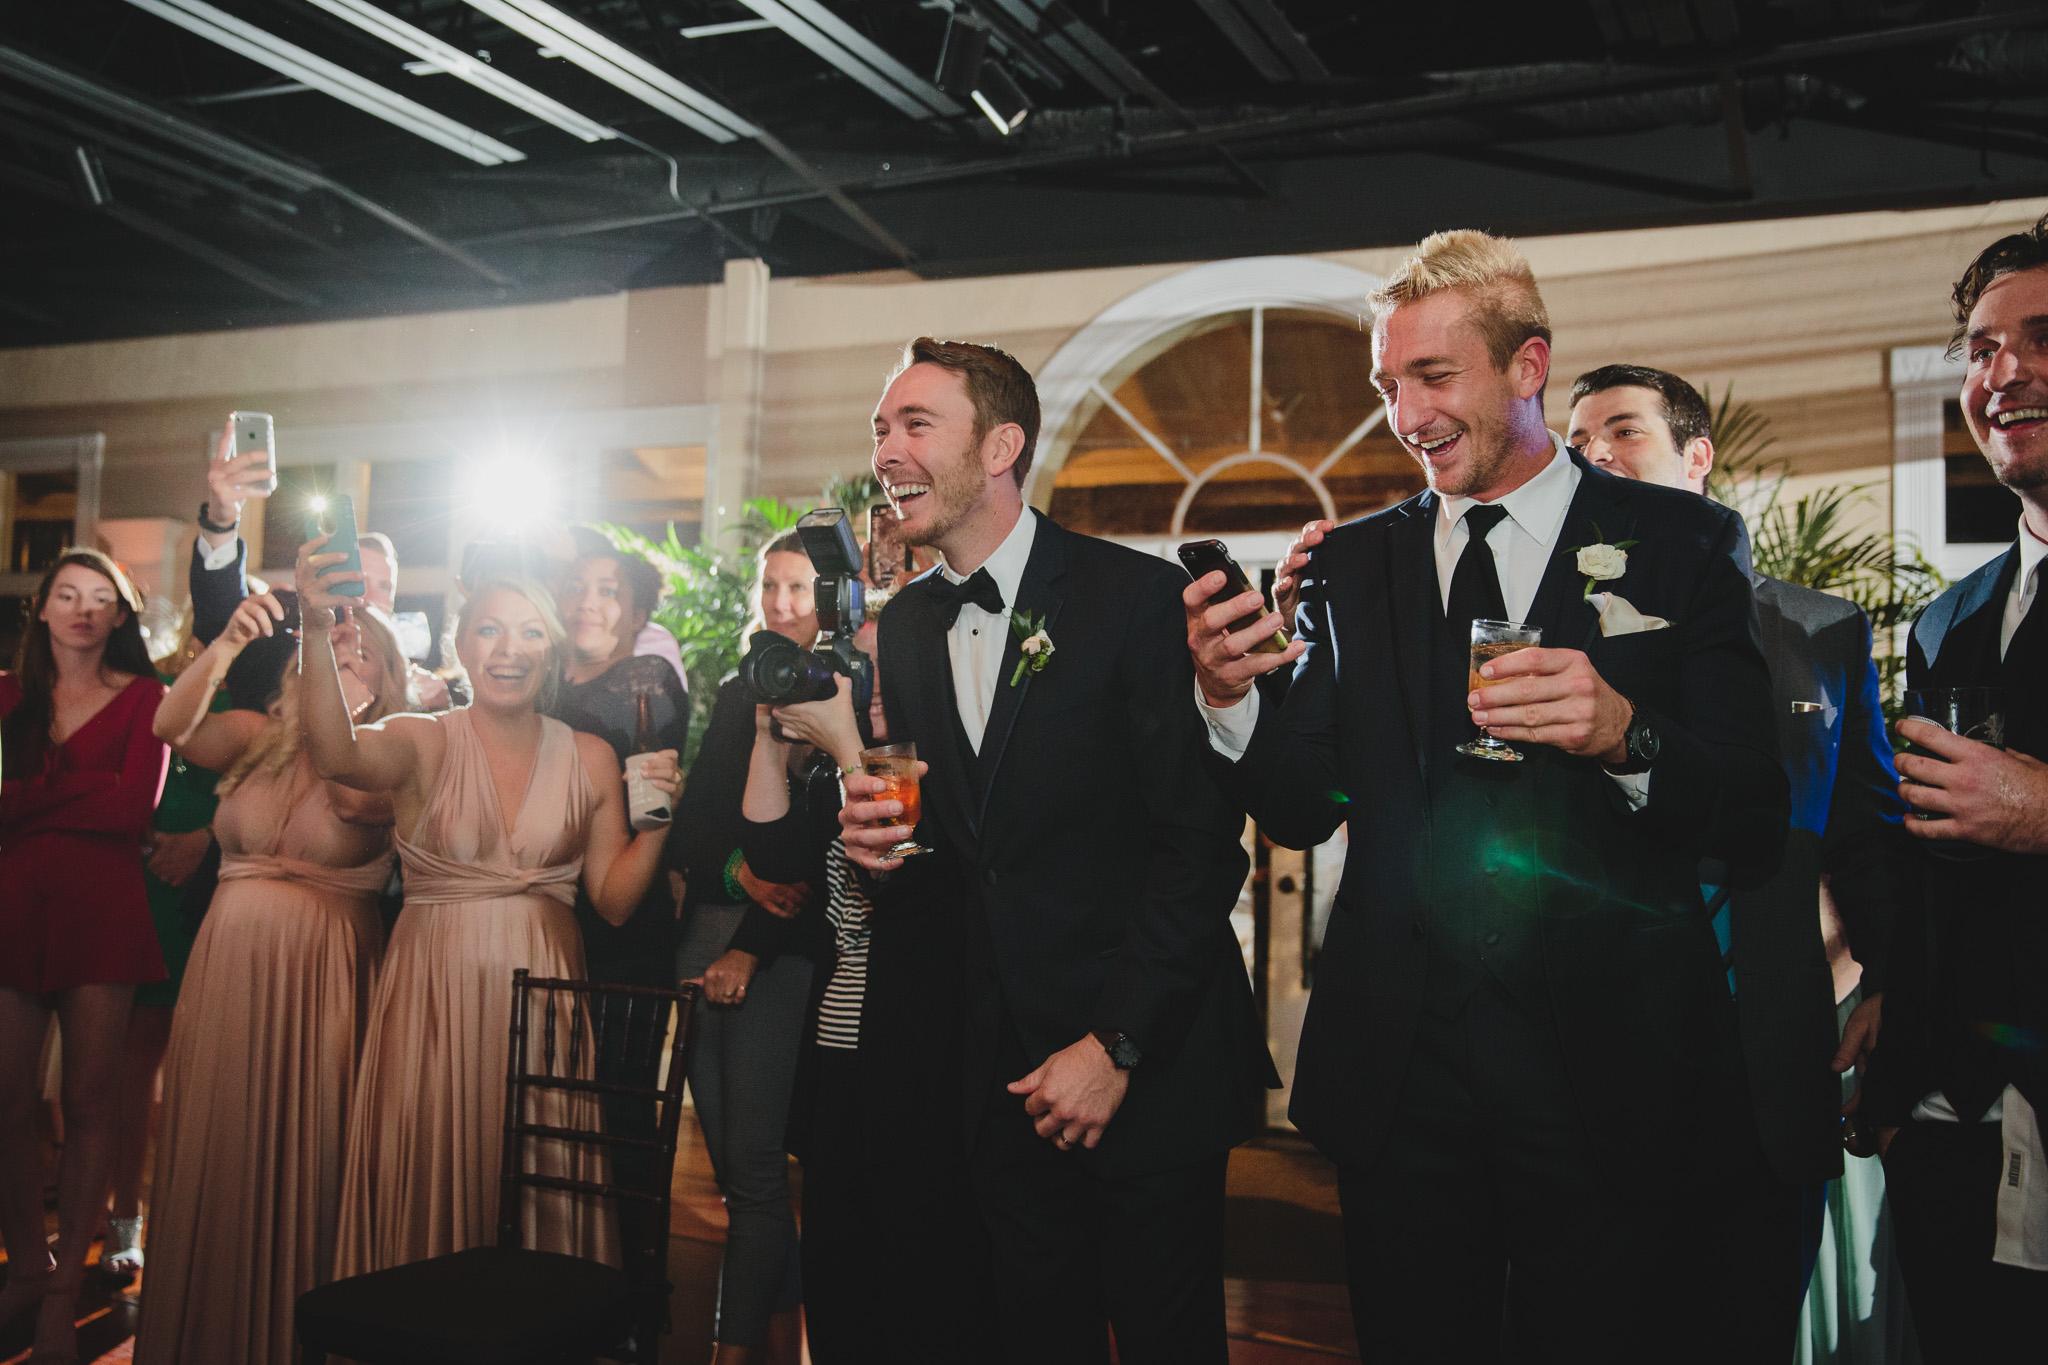 white-room-grand-ballroom-reception-wedding-venue-st-augustine-florida